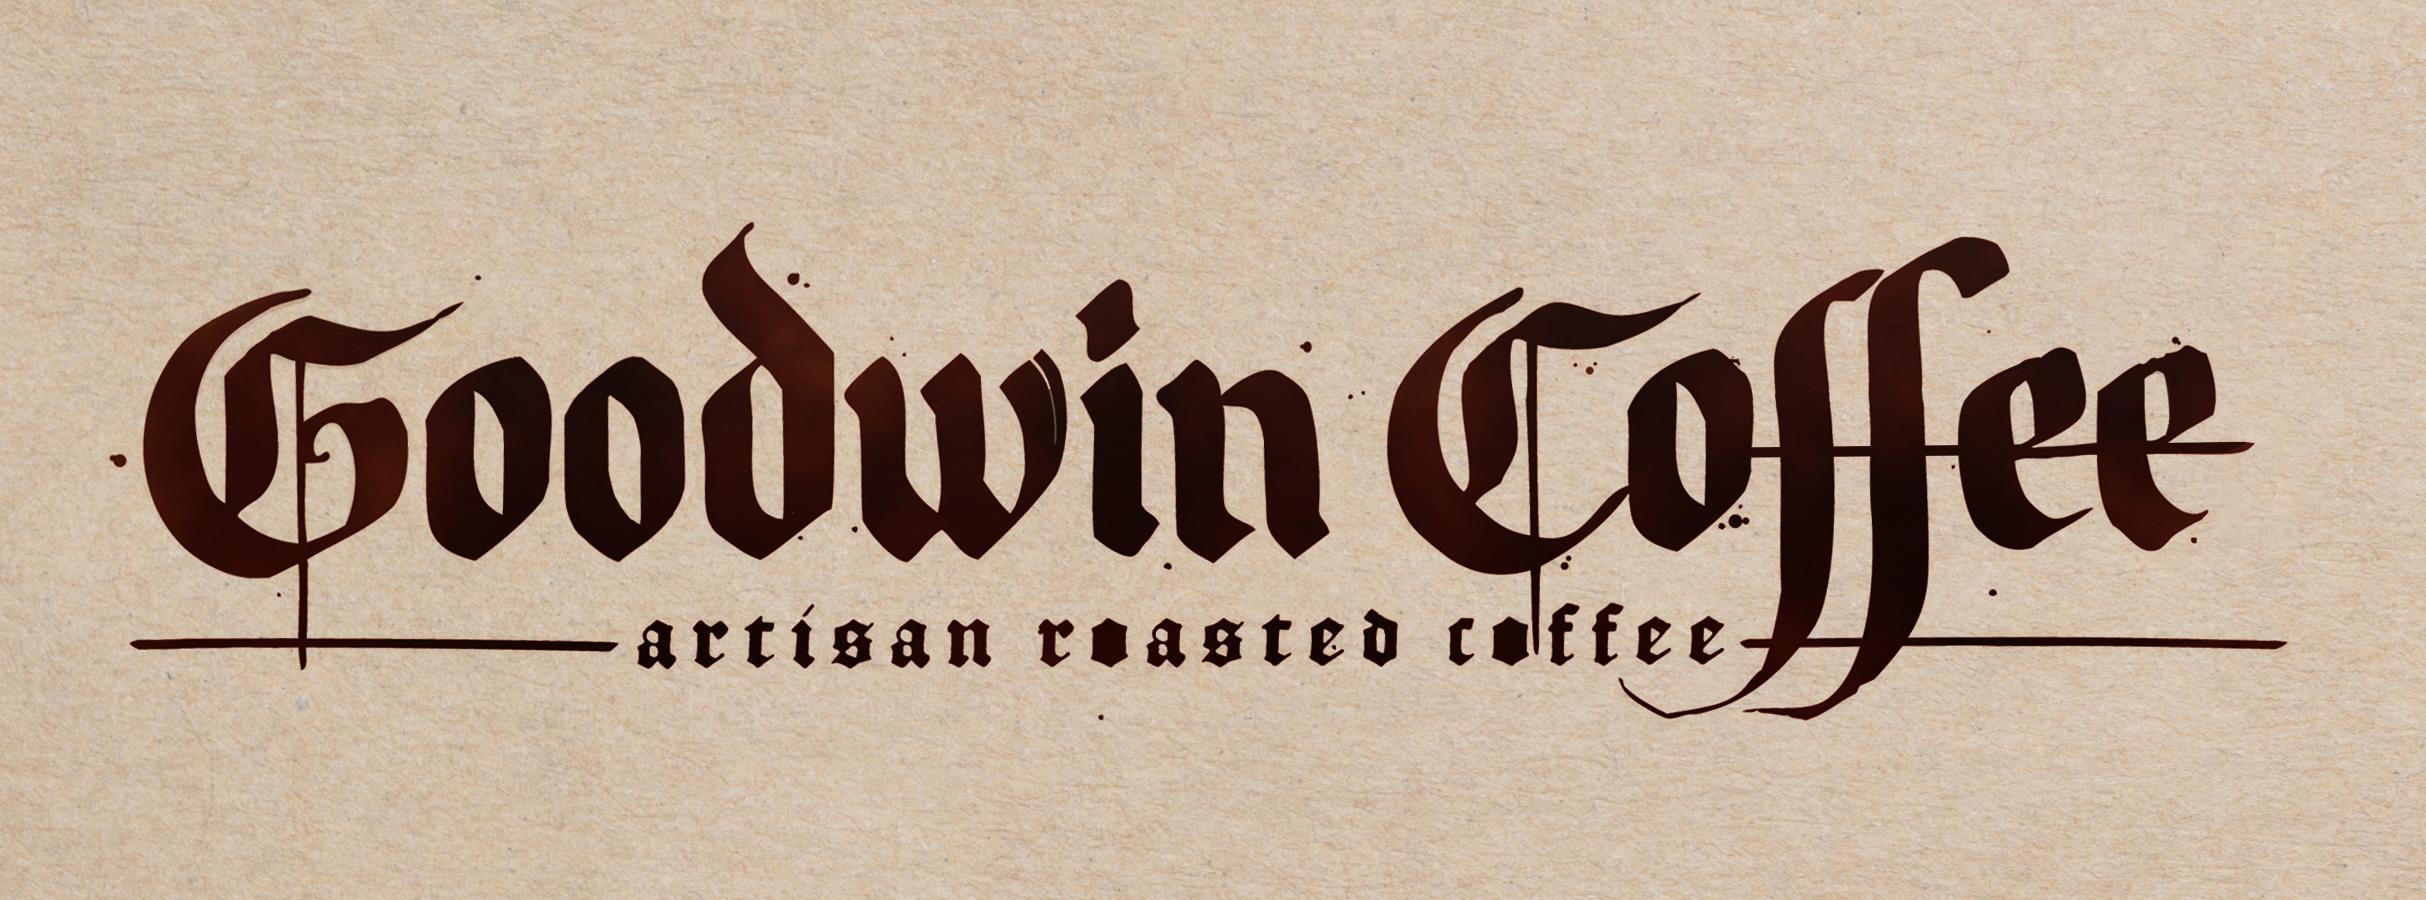 Goodwin Coffee